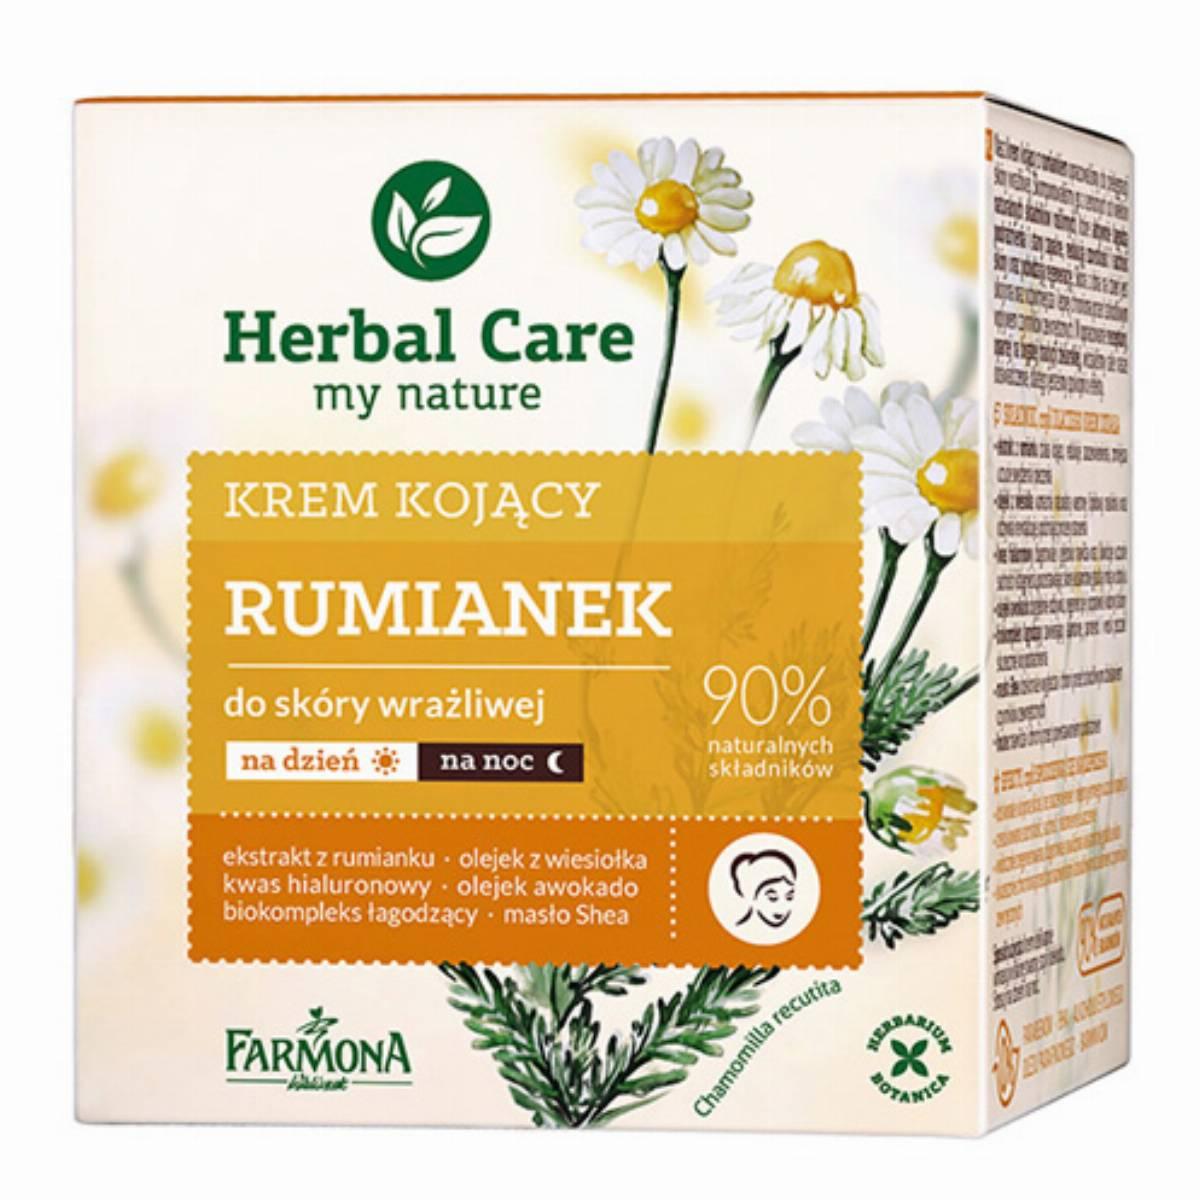 Farmona Herbal Care krem do twarzy - rumianek box